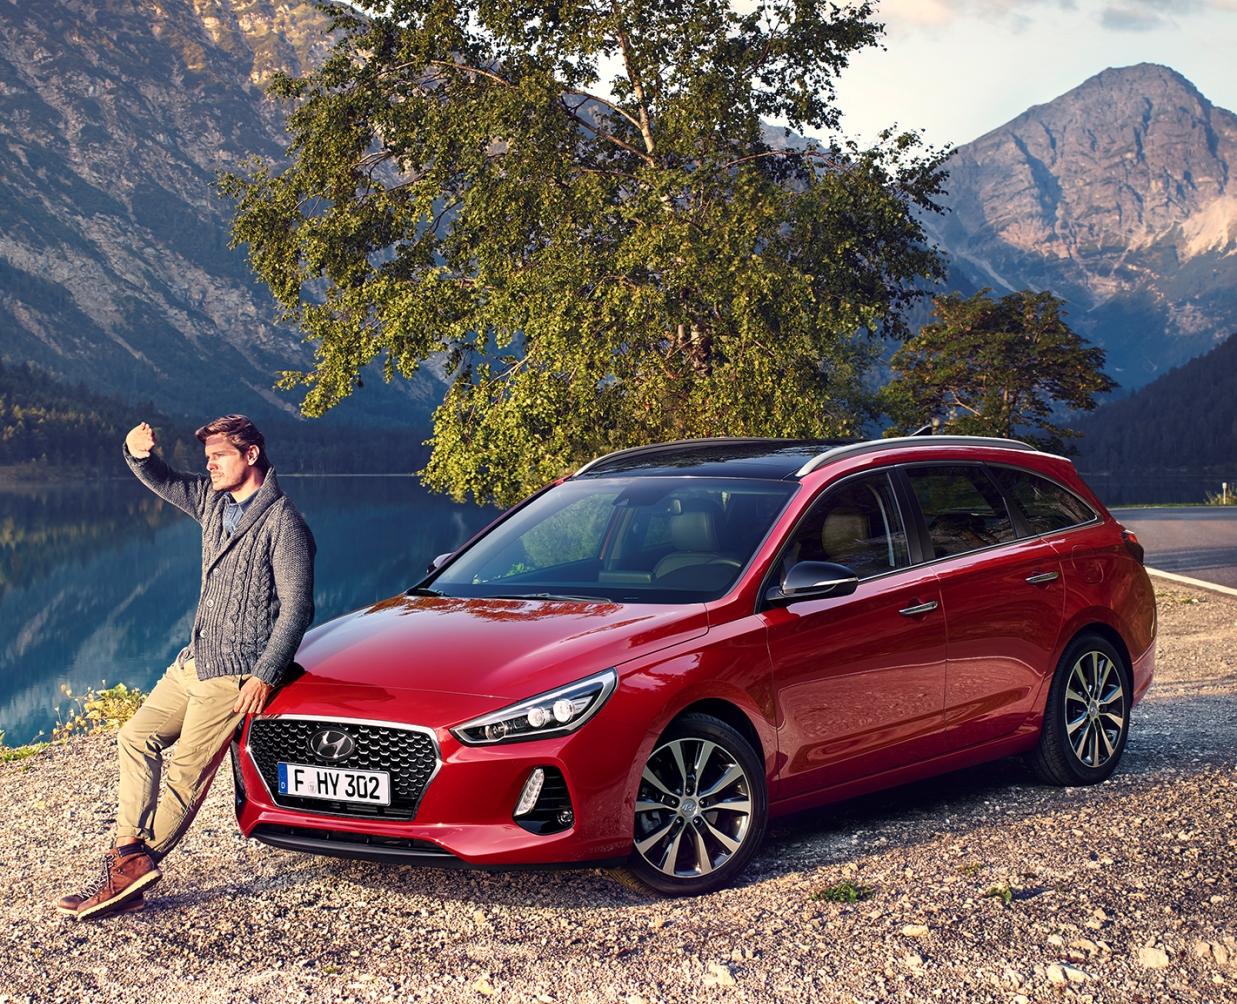 Parima hinnaga Hyundai i30 Wagon Topautost!